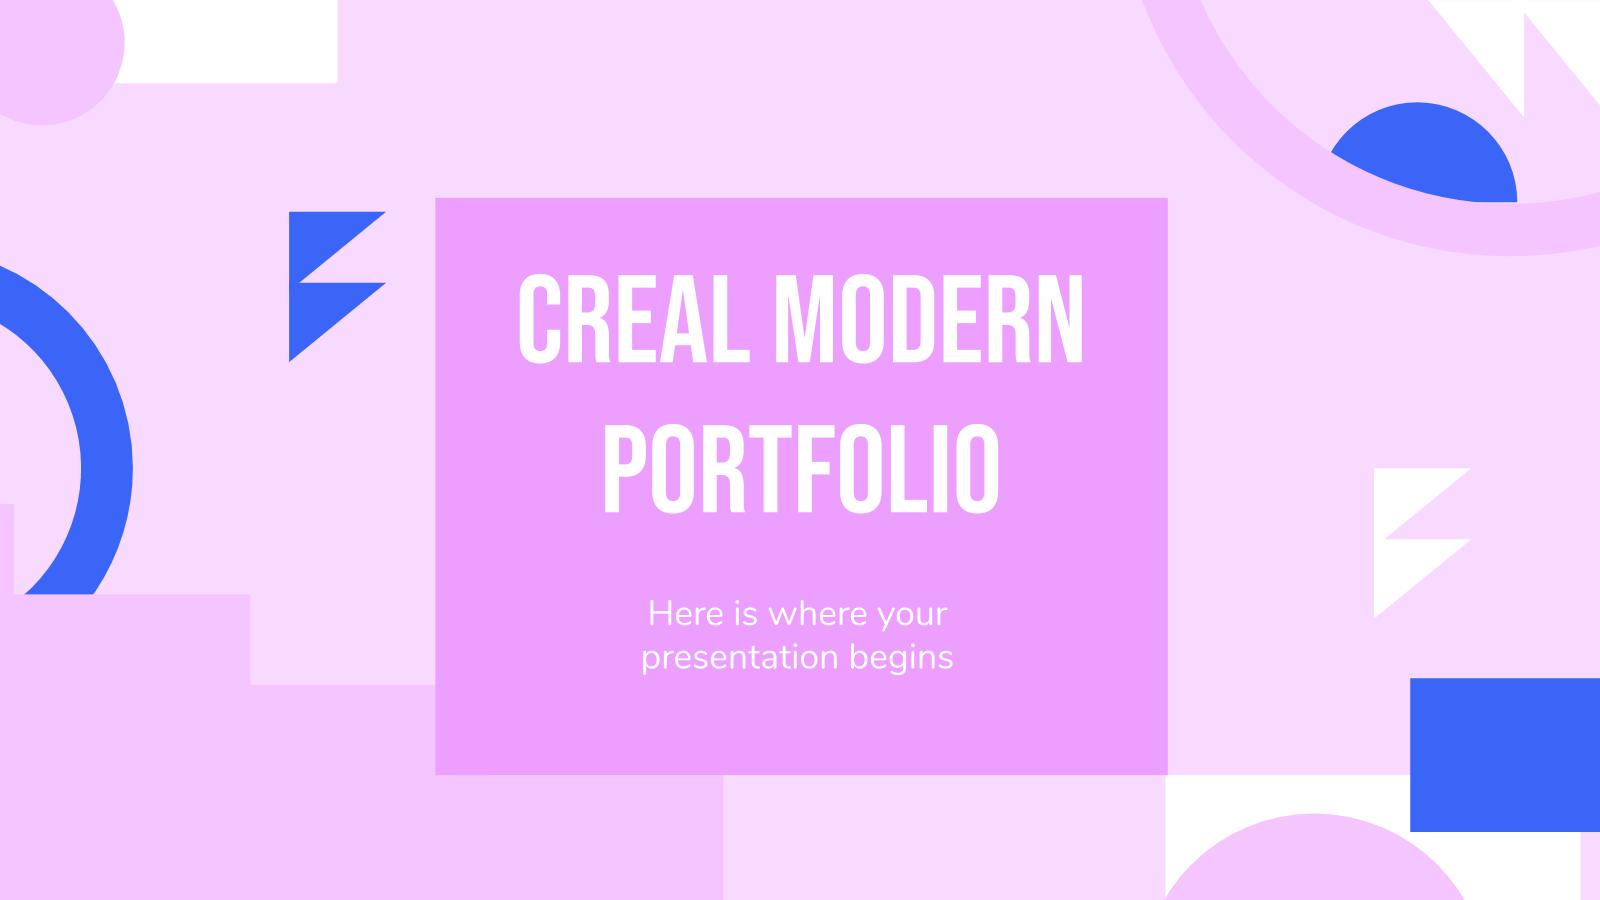 Plantilla de presentación Portafolio moderno Creal